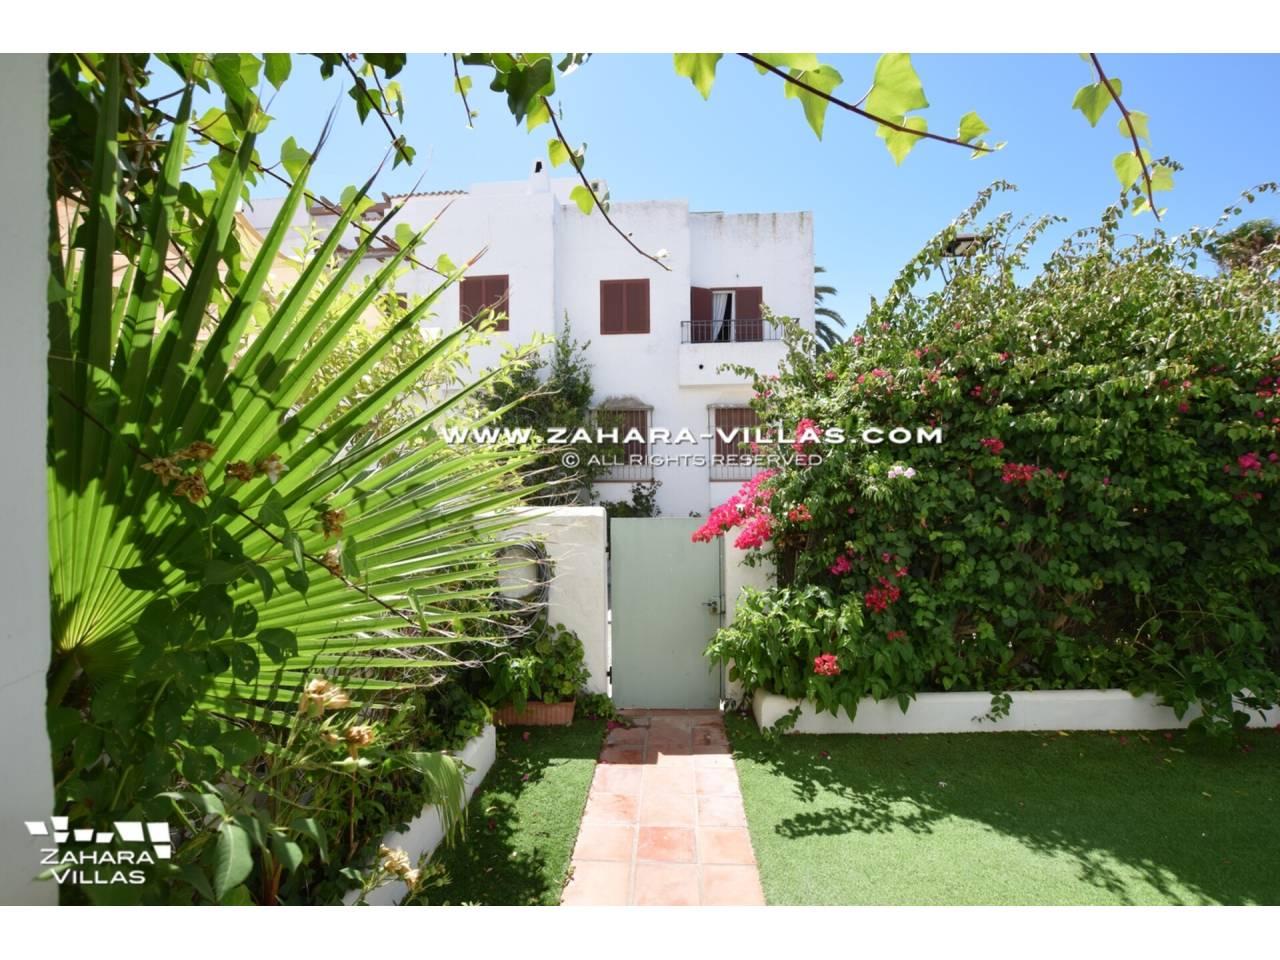 Imagen 14 de House for sale close to the beach, with sea views in Zahara de los Atunes